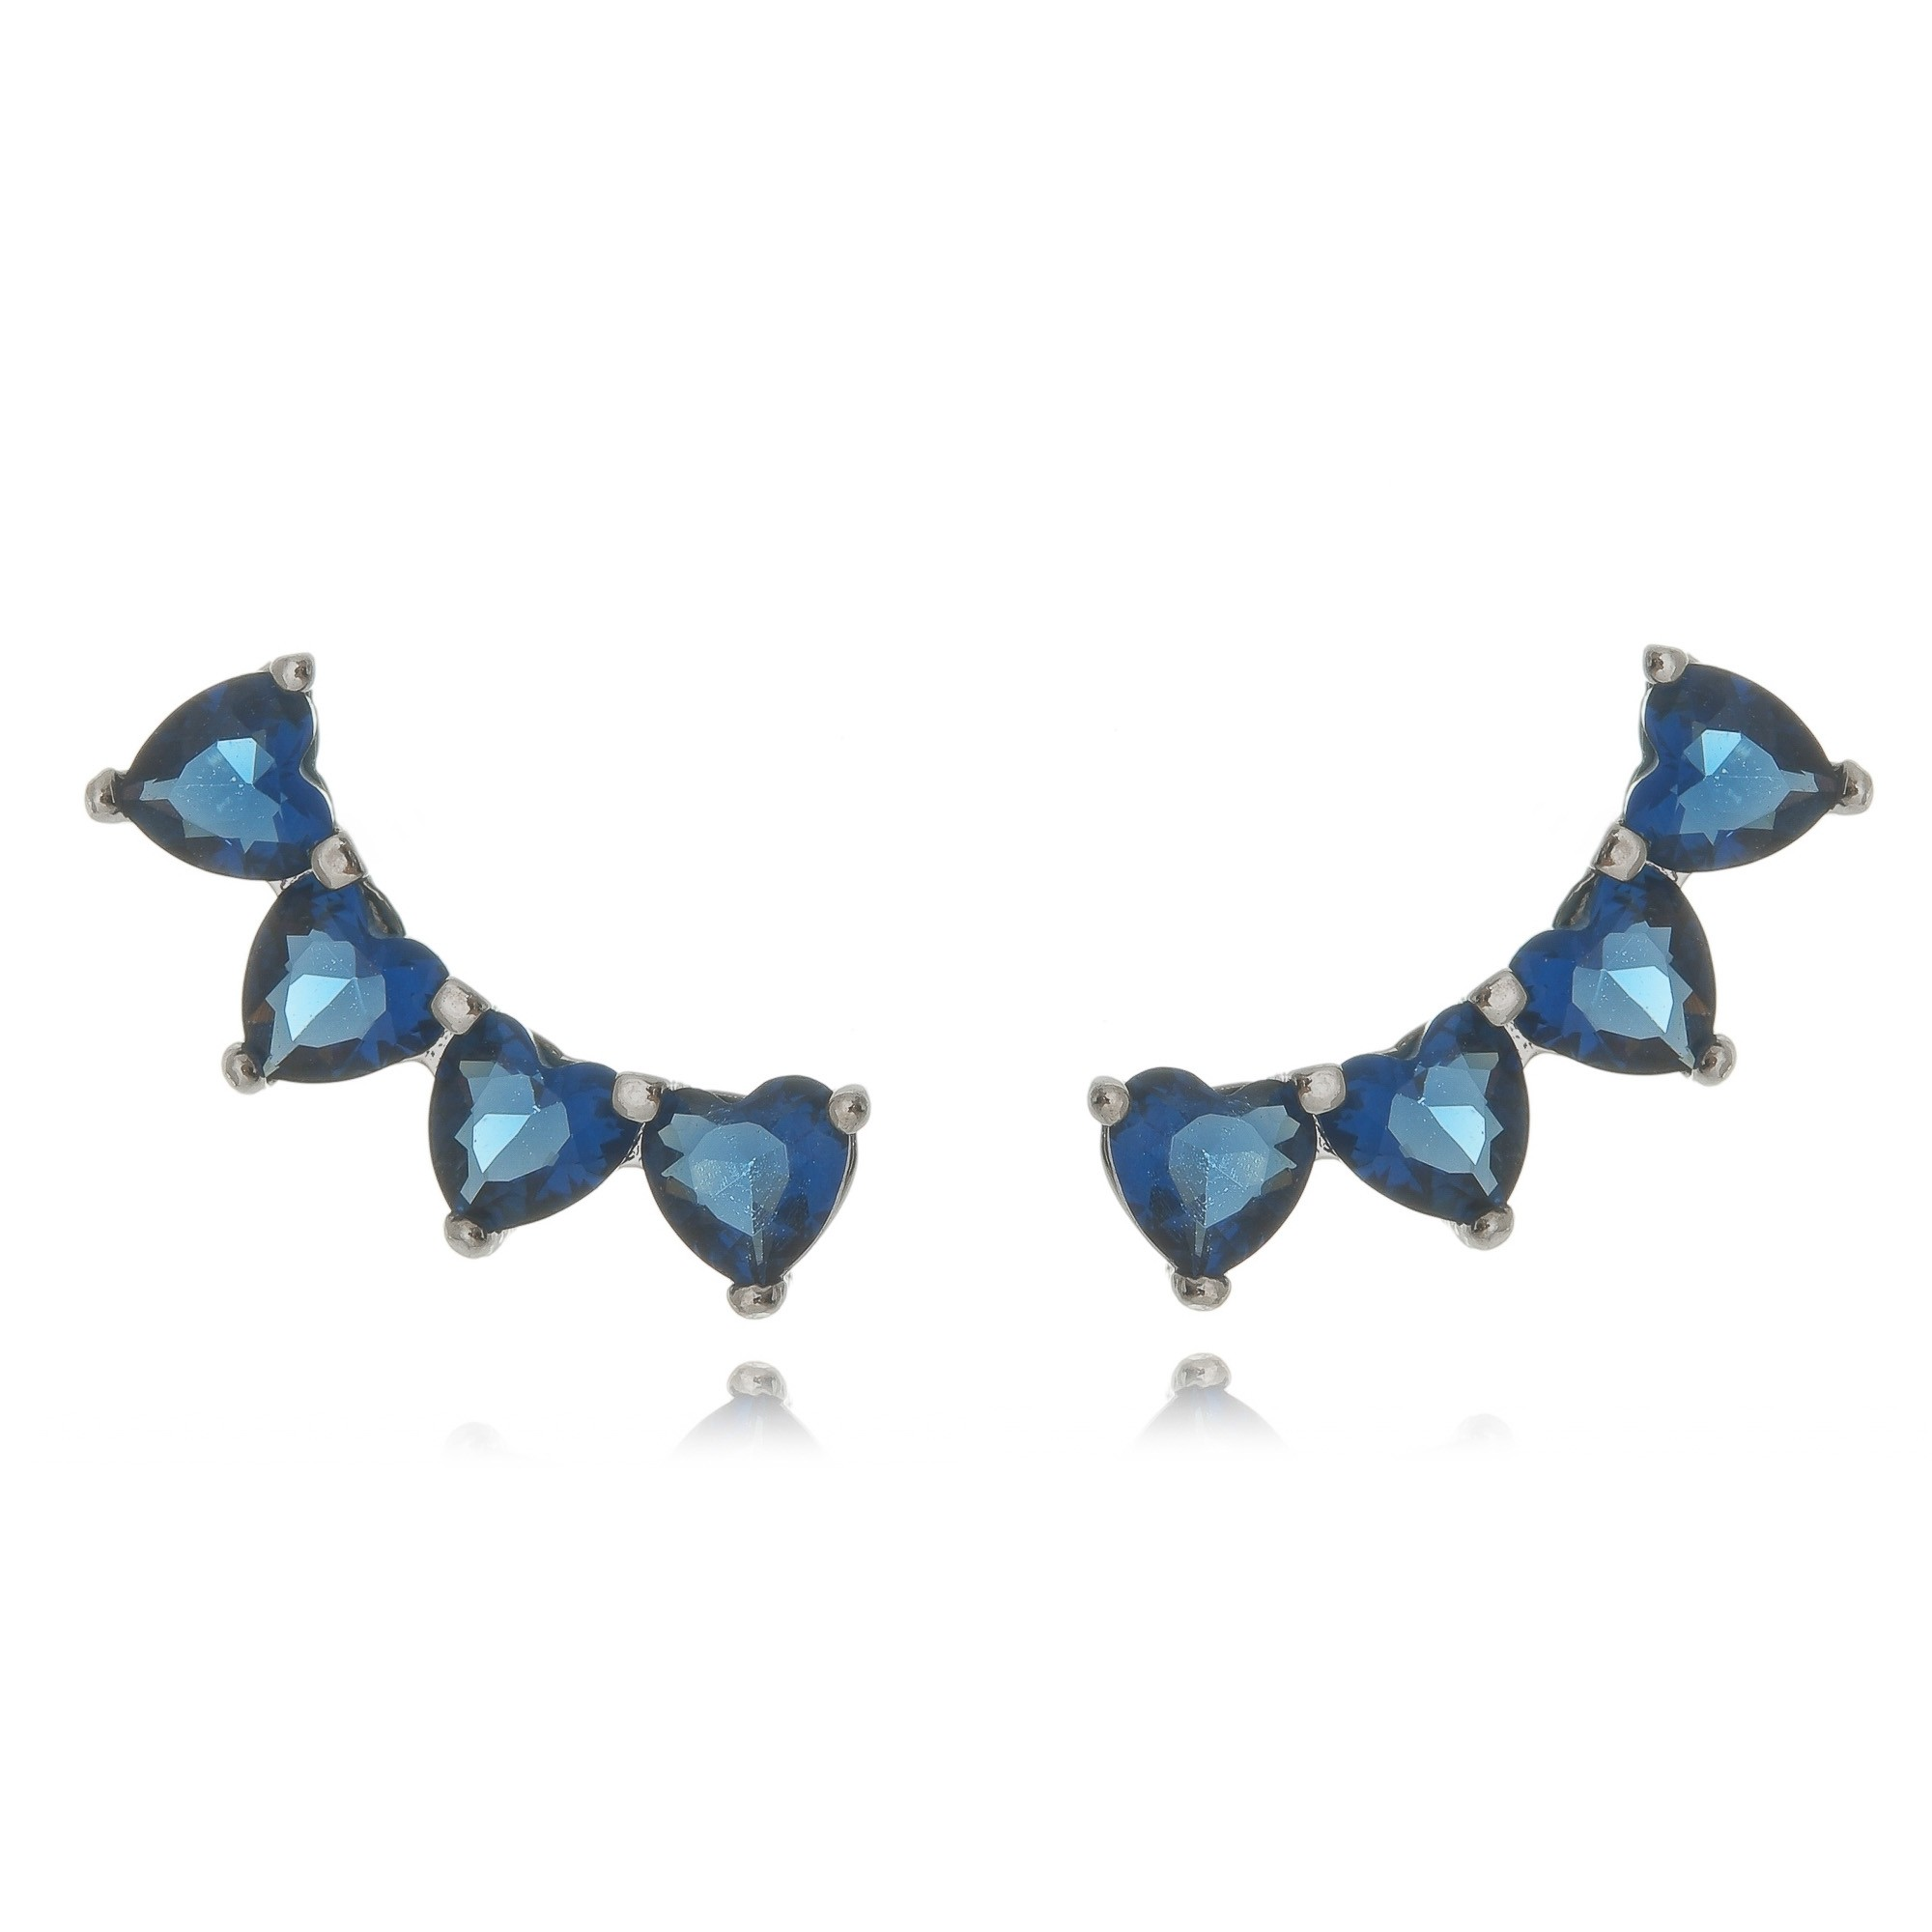 Brinco Ear Cuff Prata Mini Corações Azul Semijoia em Ródio Branco  - Soloyou